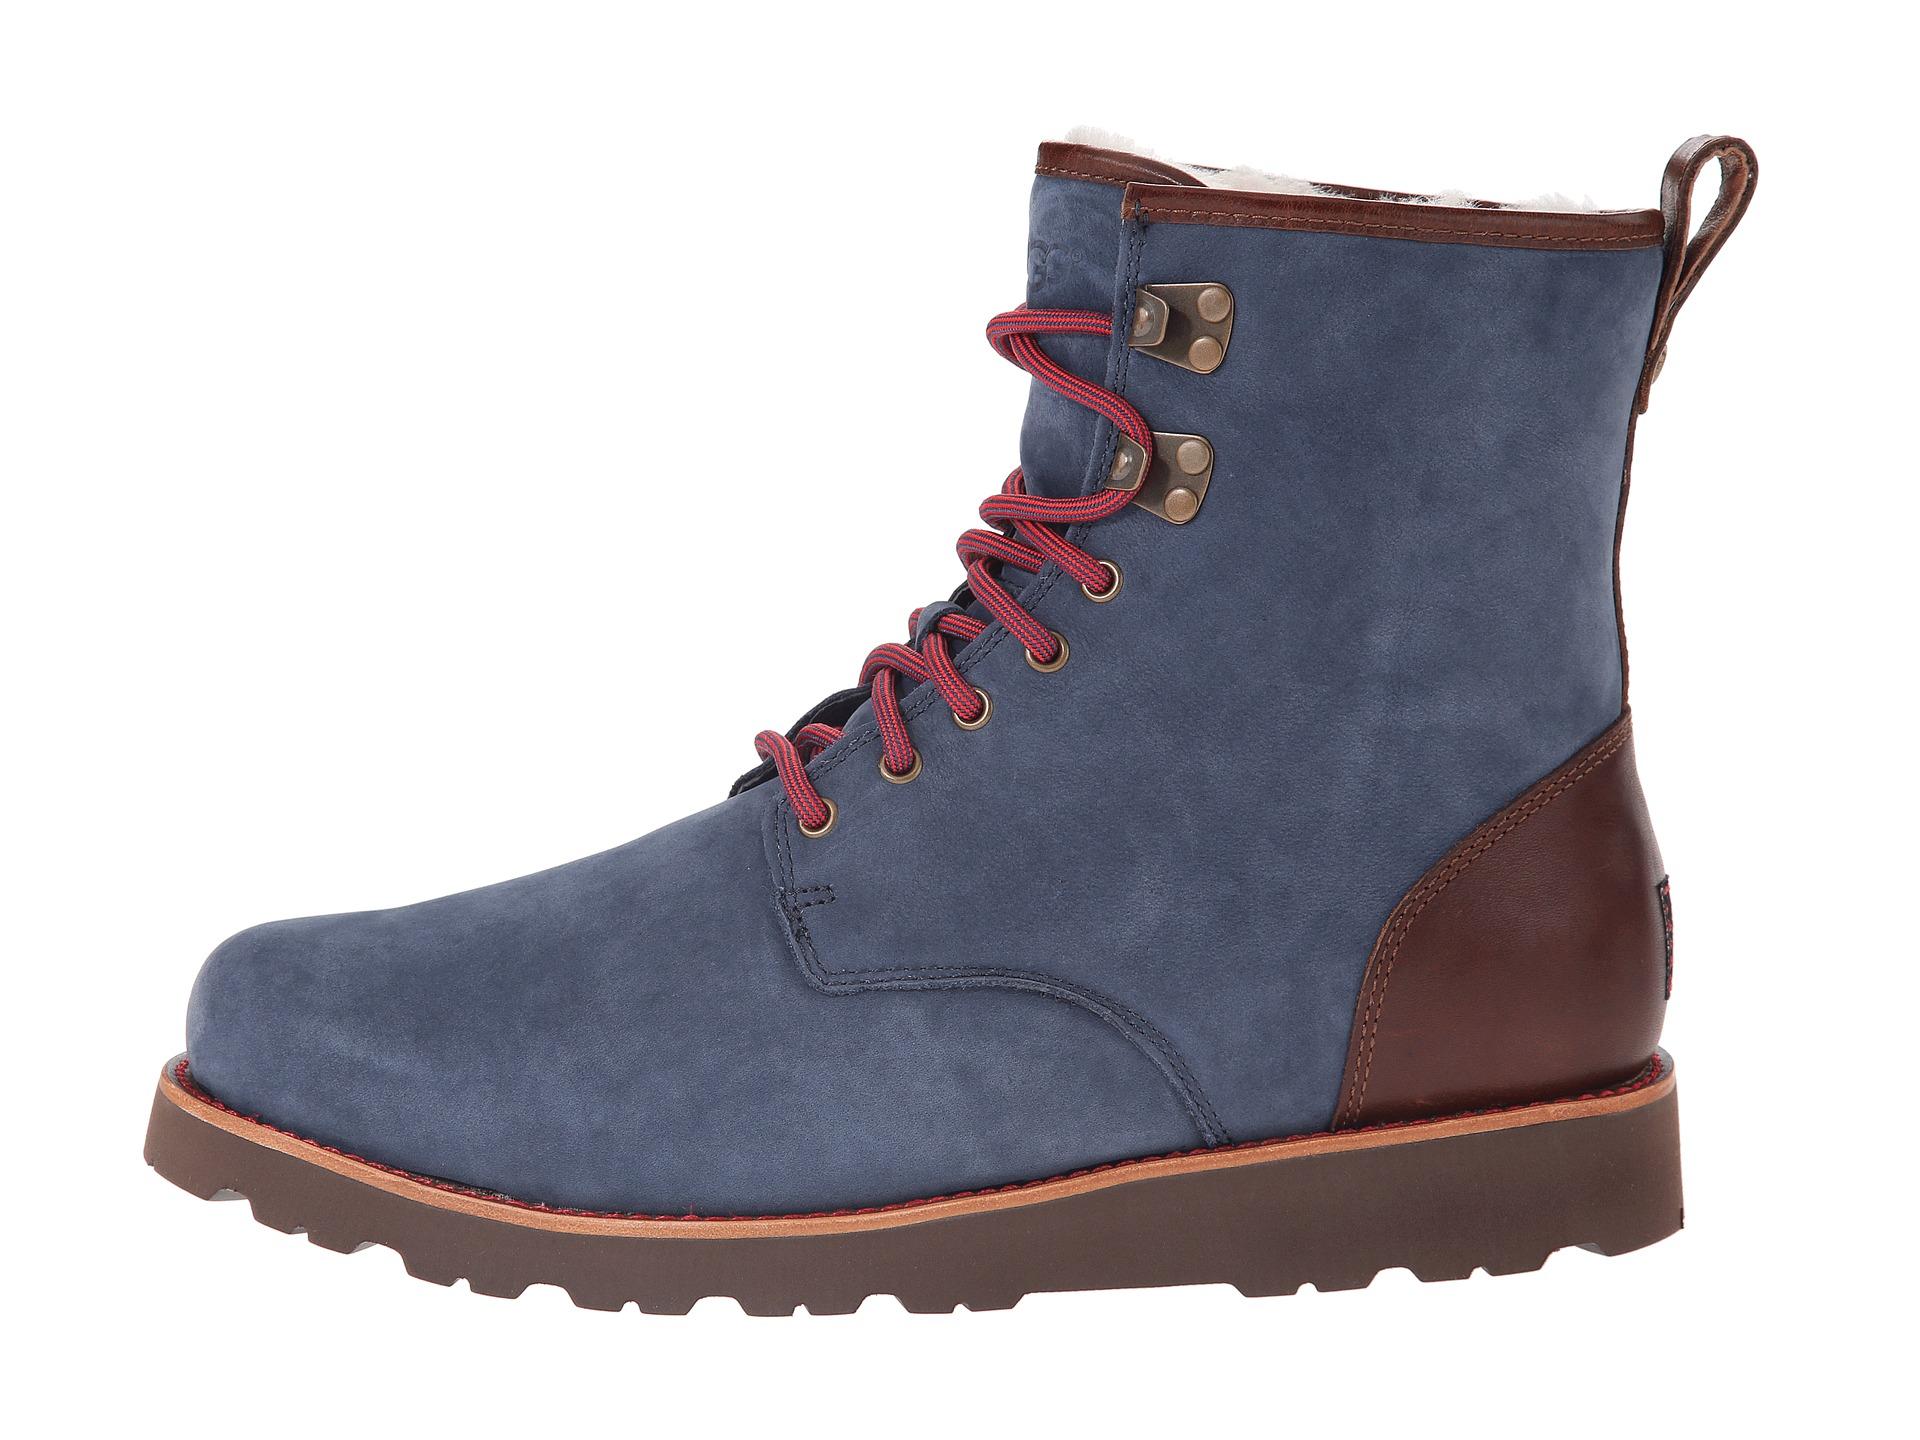 ugg boots tupelo ms